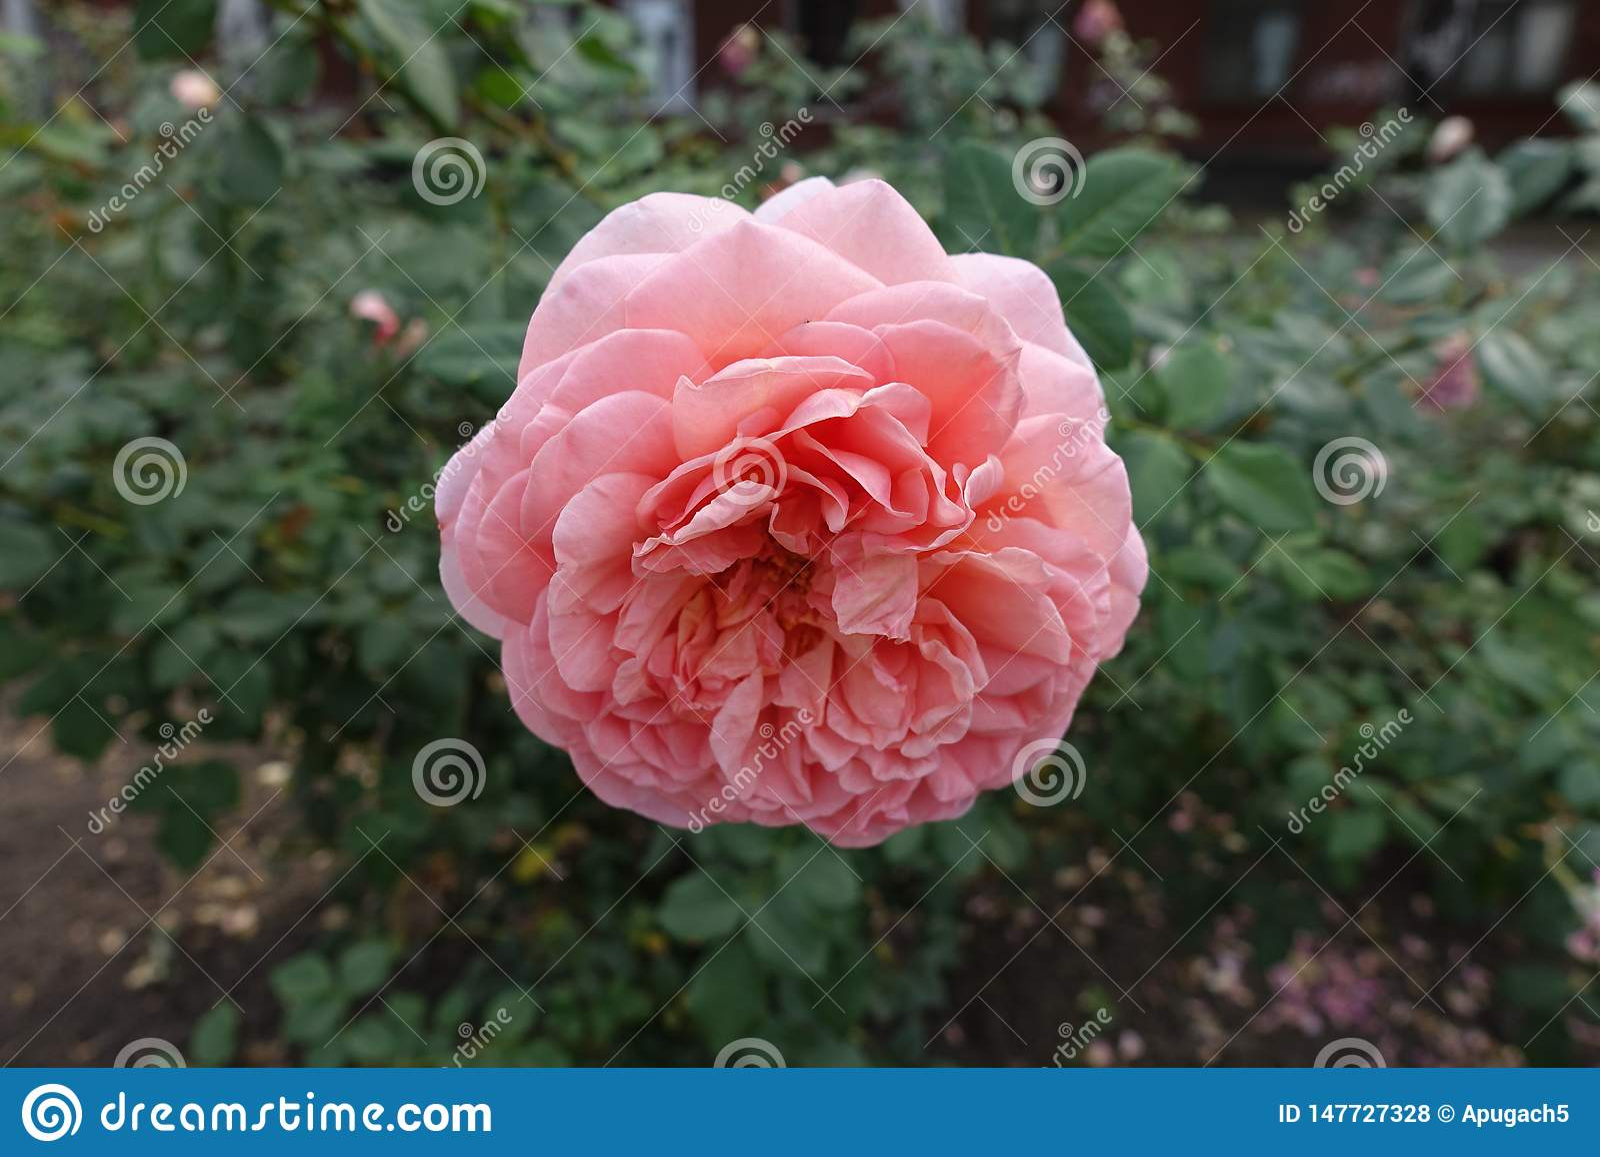 Близкий взгляд розового цветка розы